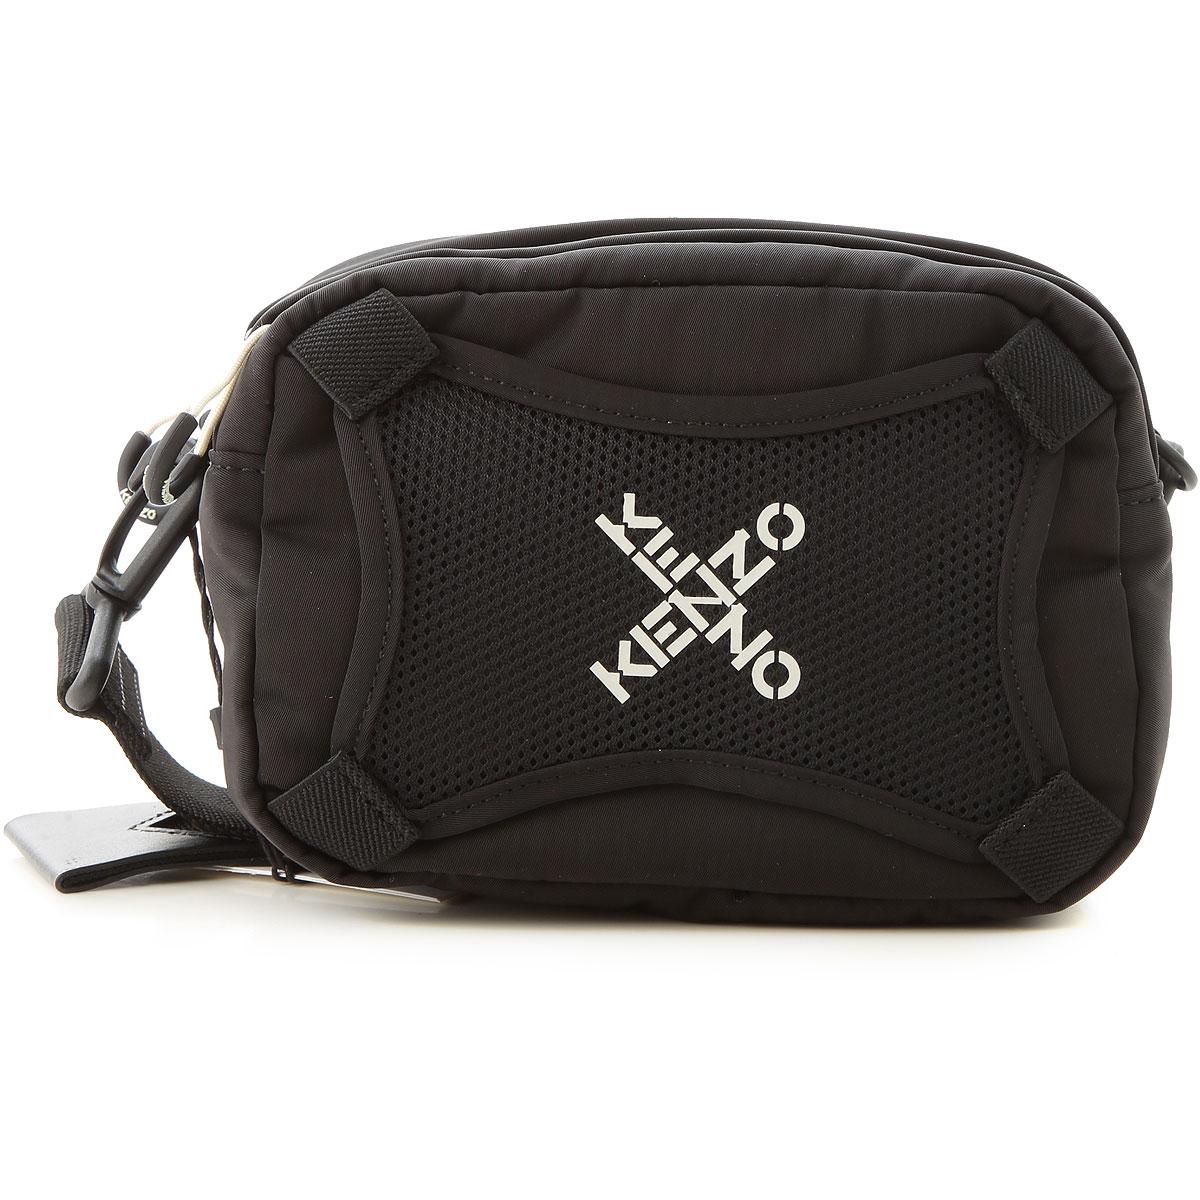 Kenzo Briefcases, Black, Nylon, 2019